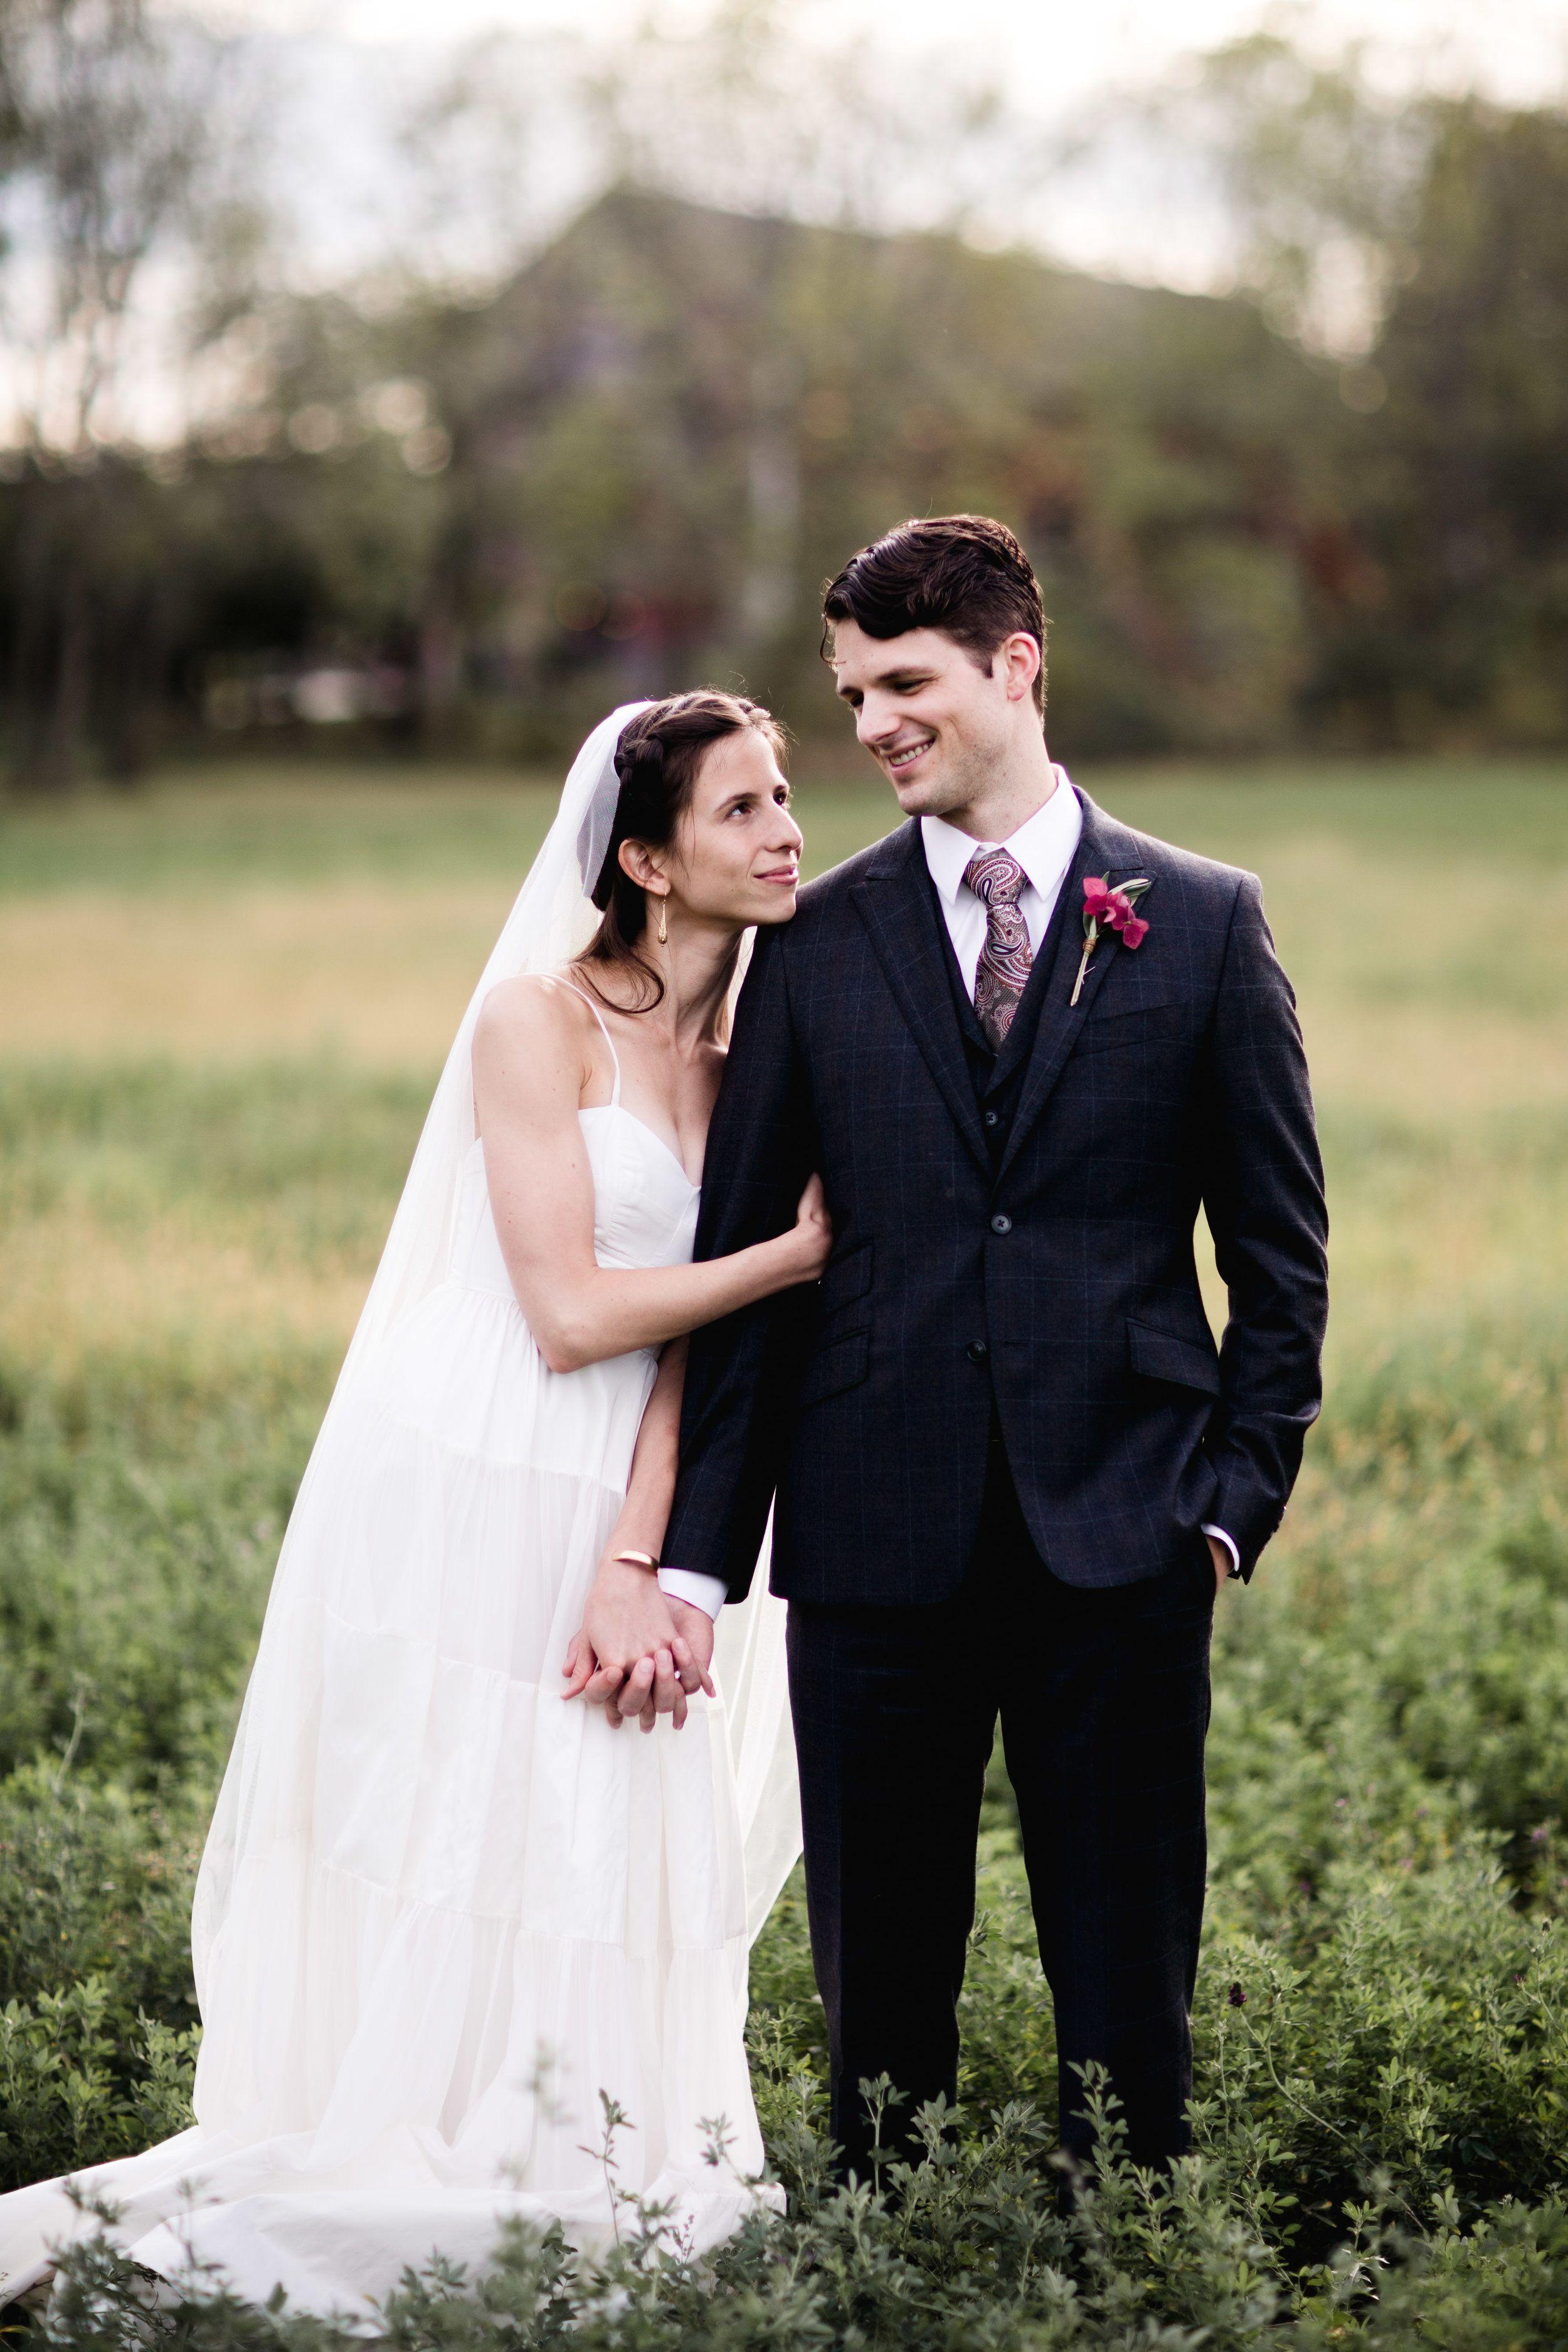 Nature wedding dress  Fall Meadow Wedding  Natural Wedding Makeup look  Spaghetti